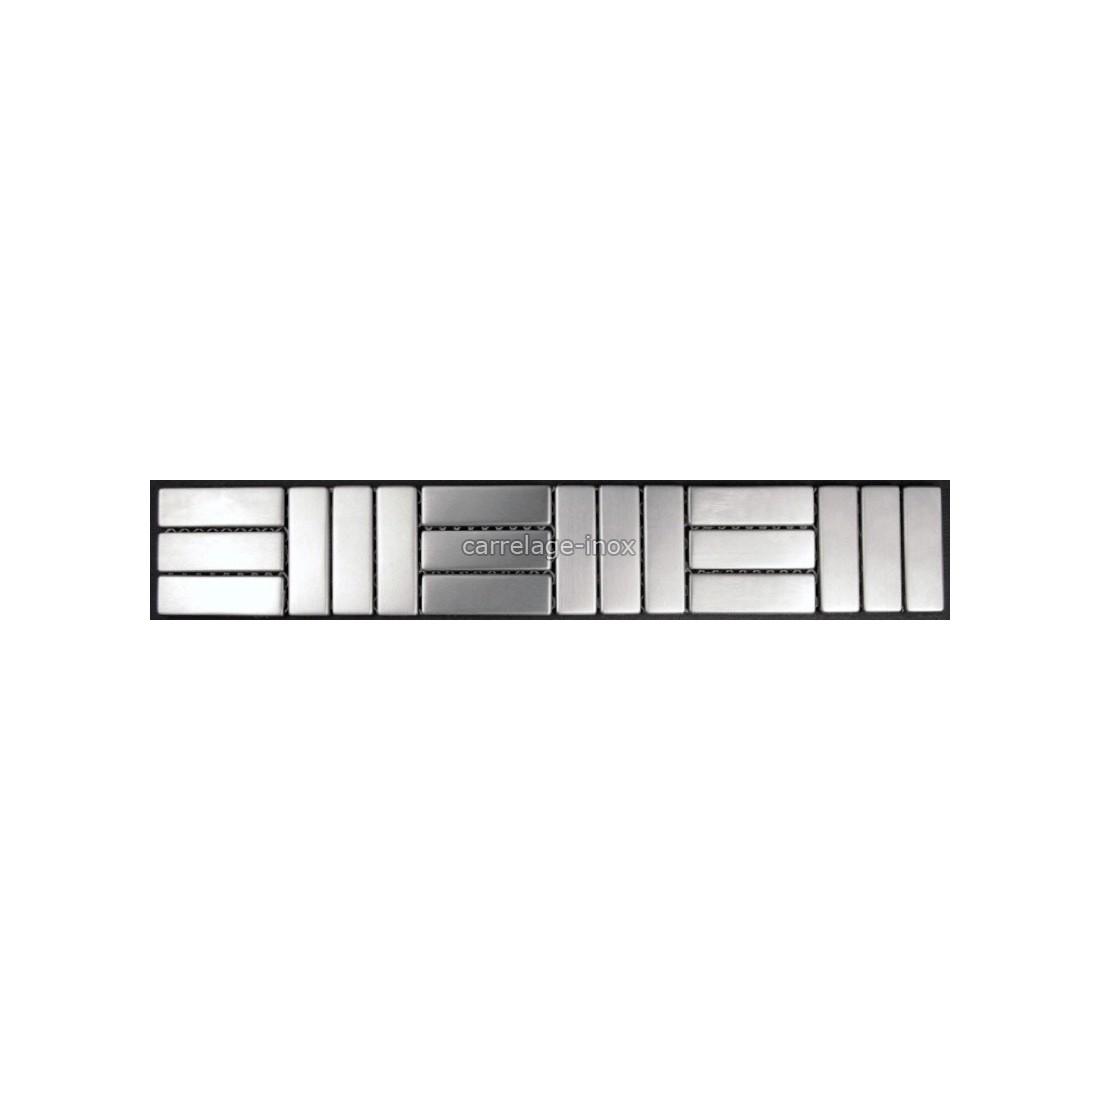 listel inox frise acier metal mosaique carrelage bordure duplica. Black Bedroom Furniture Sets. Home Design Ideas